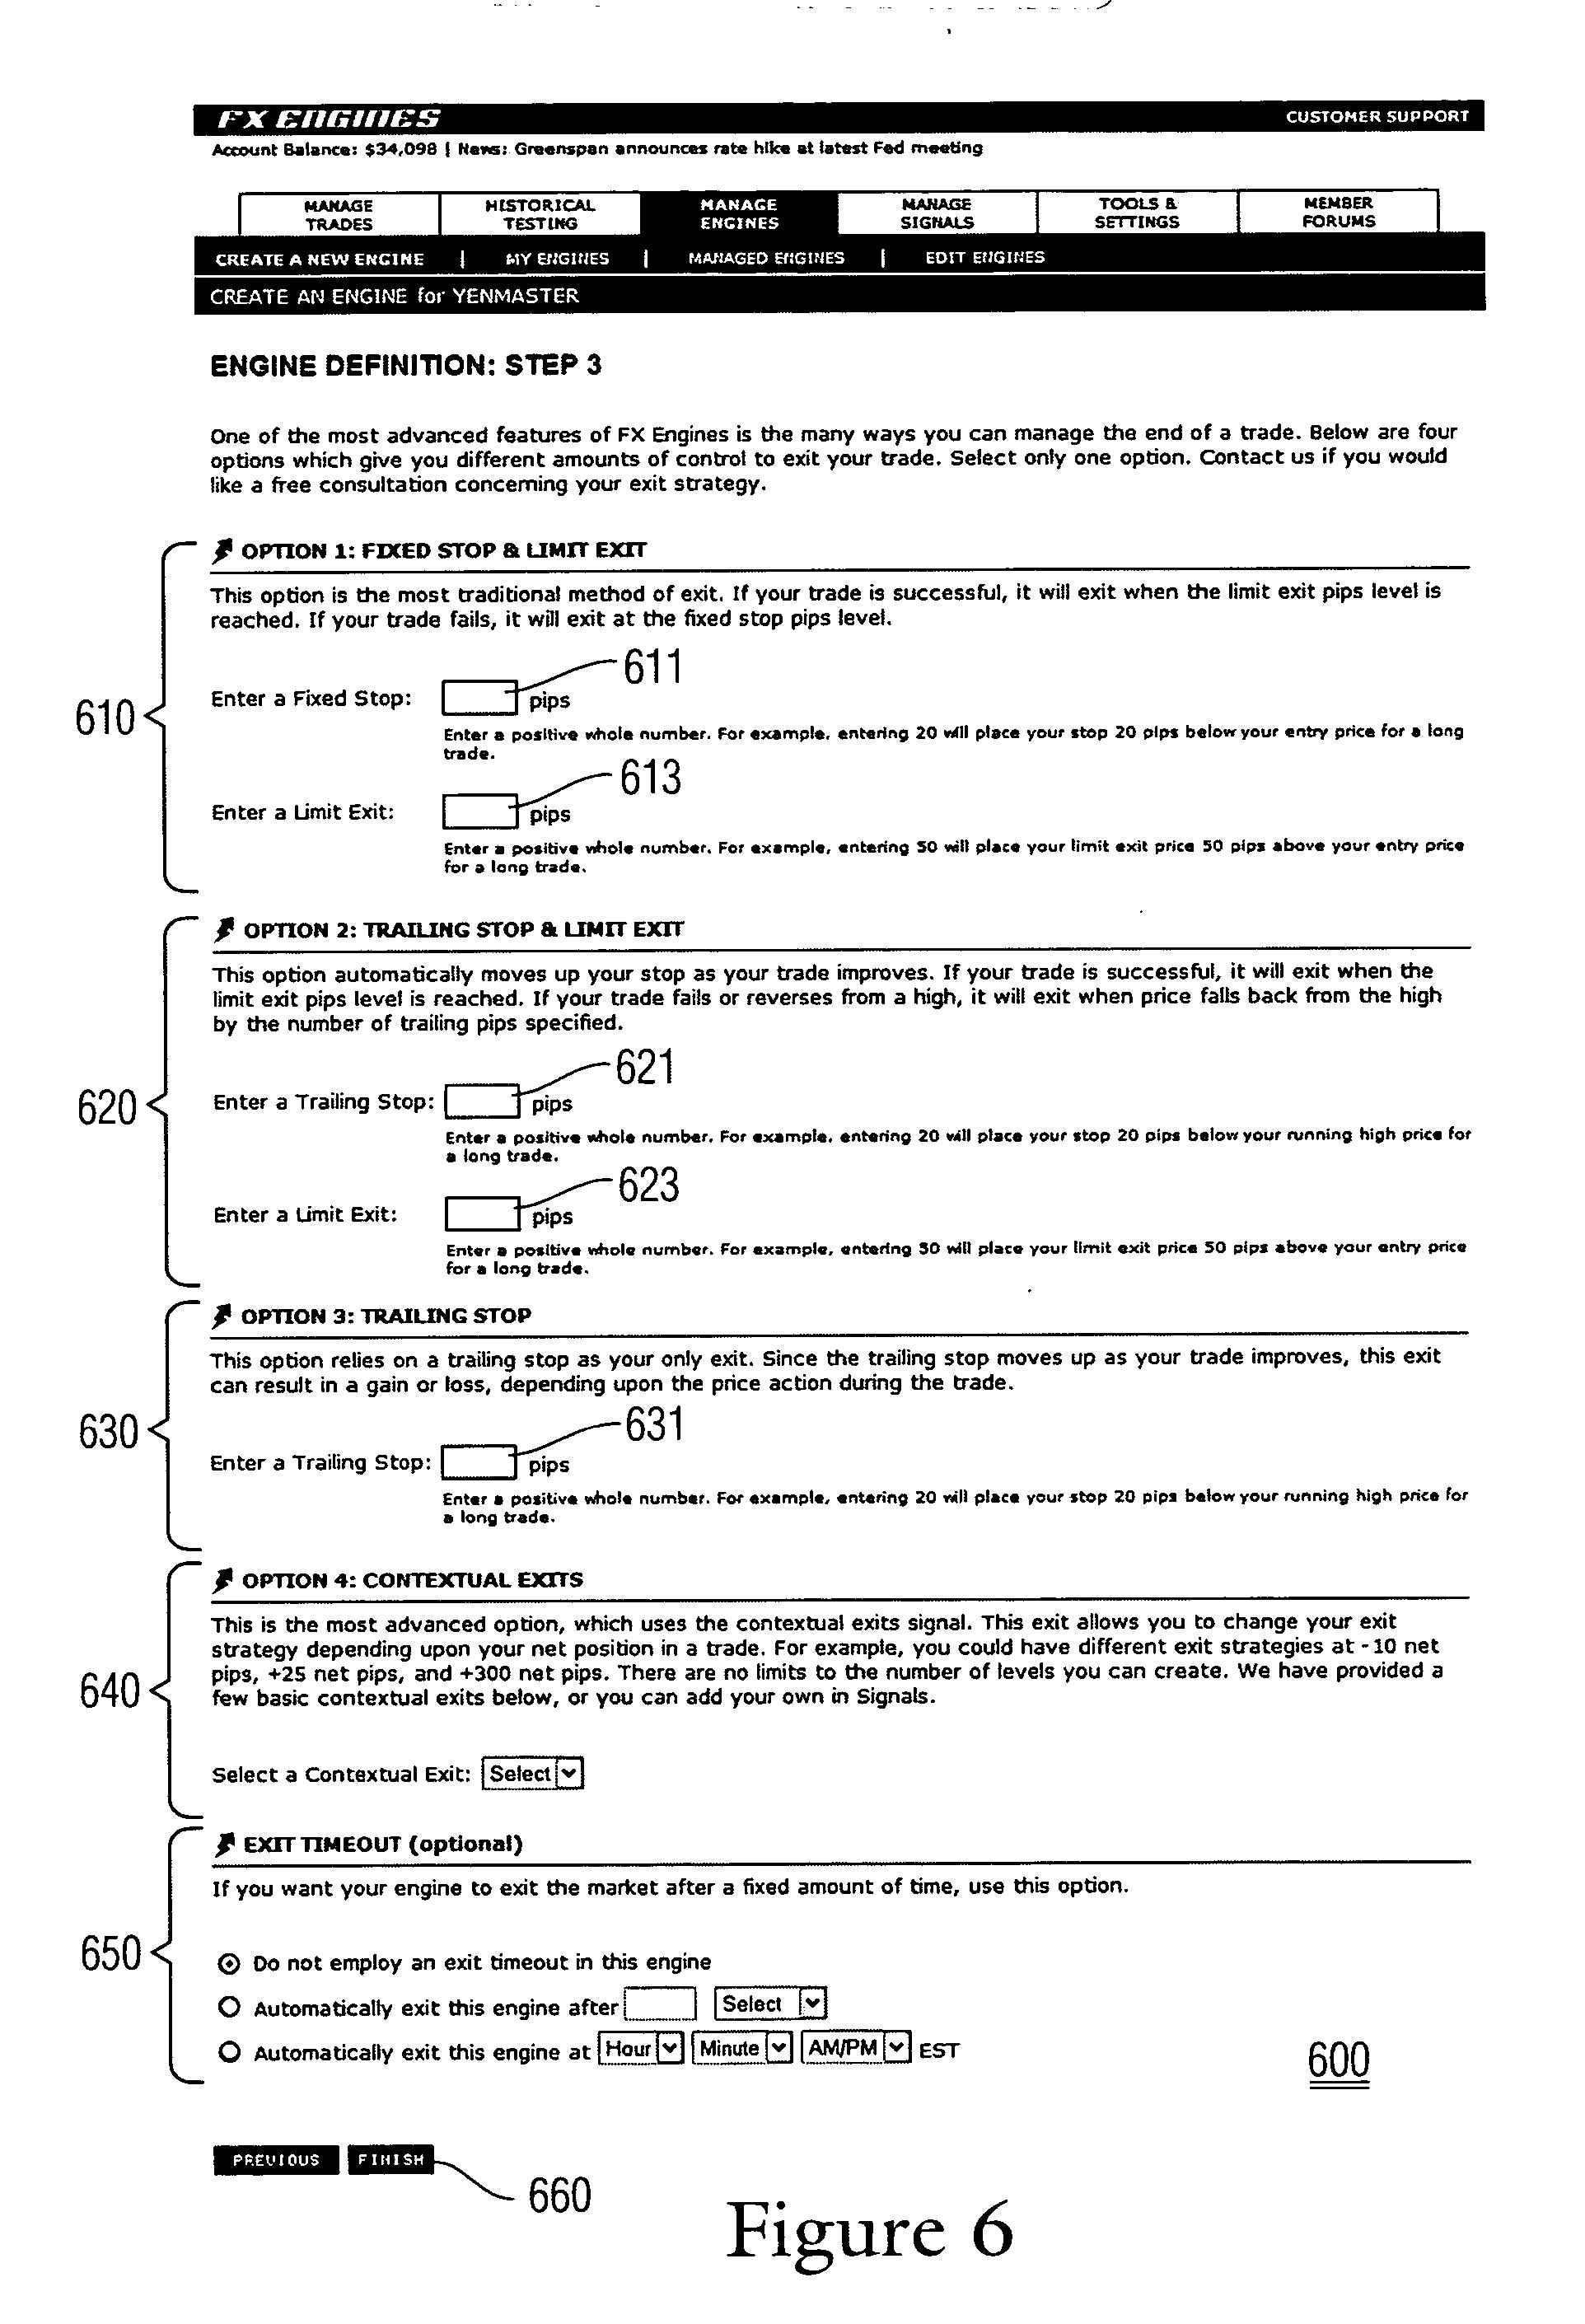 computerized financial mangement system 79 does the financial system have the  81 is the financial accounting and reporting system computerized  financial management assessment questionnaire.